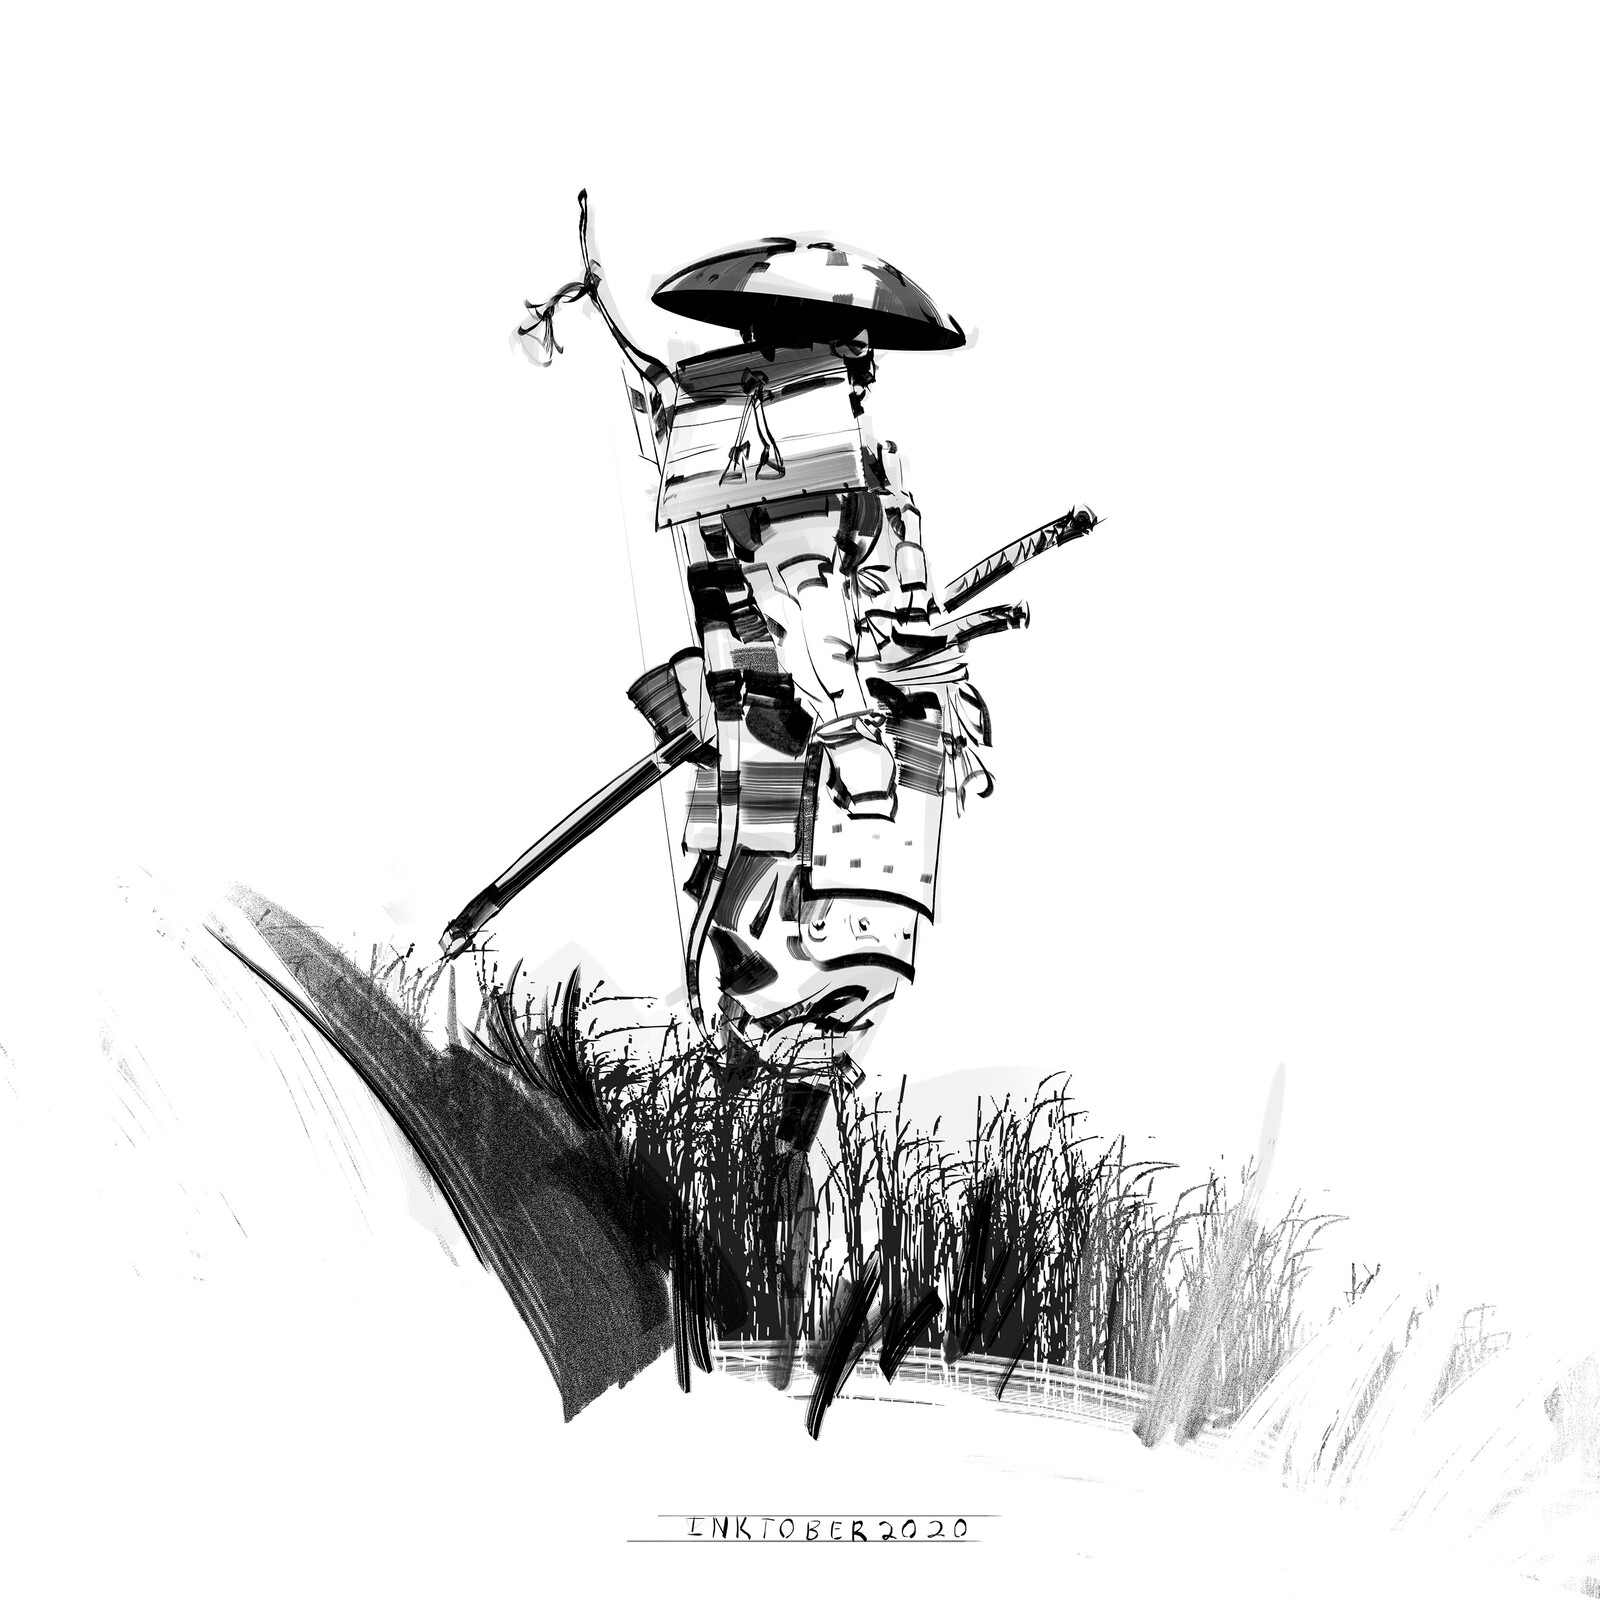 Inktober, Ghost of Tsushima addition! WEEK 1